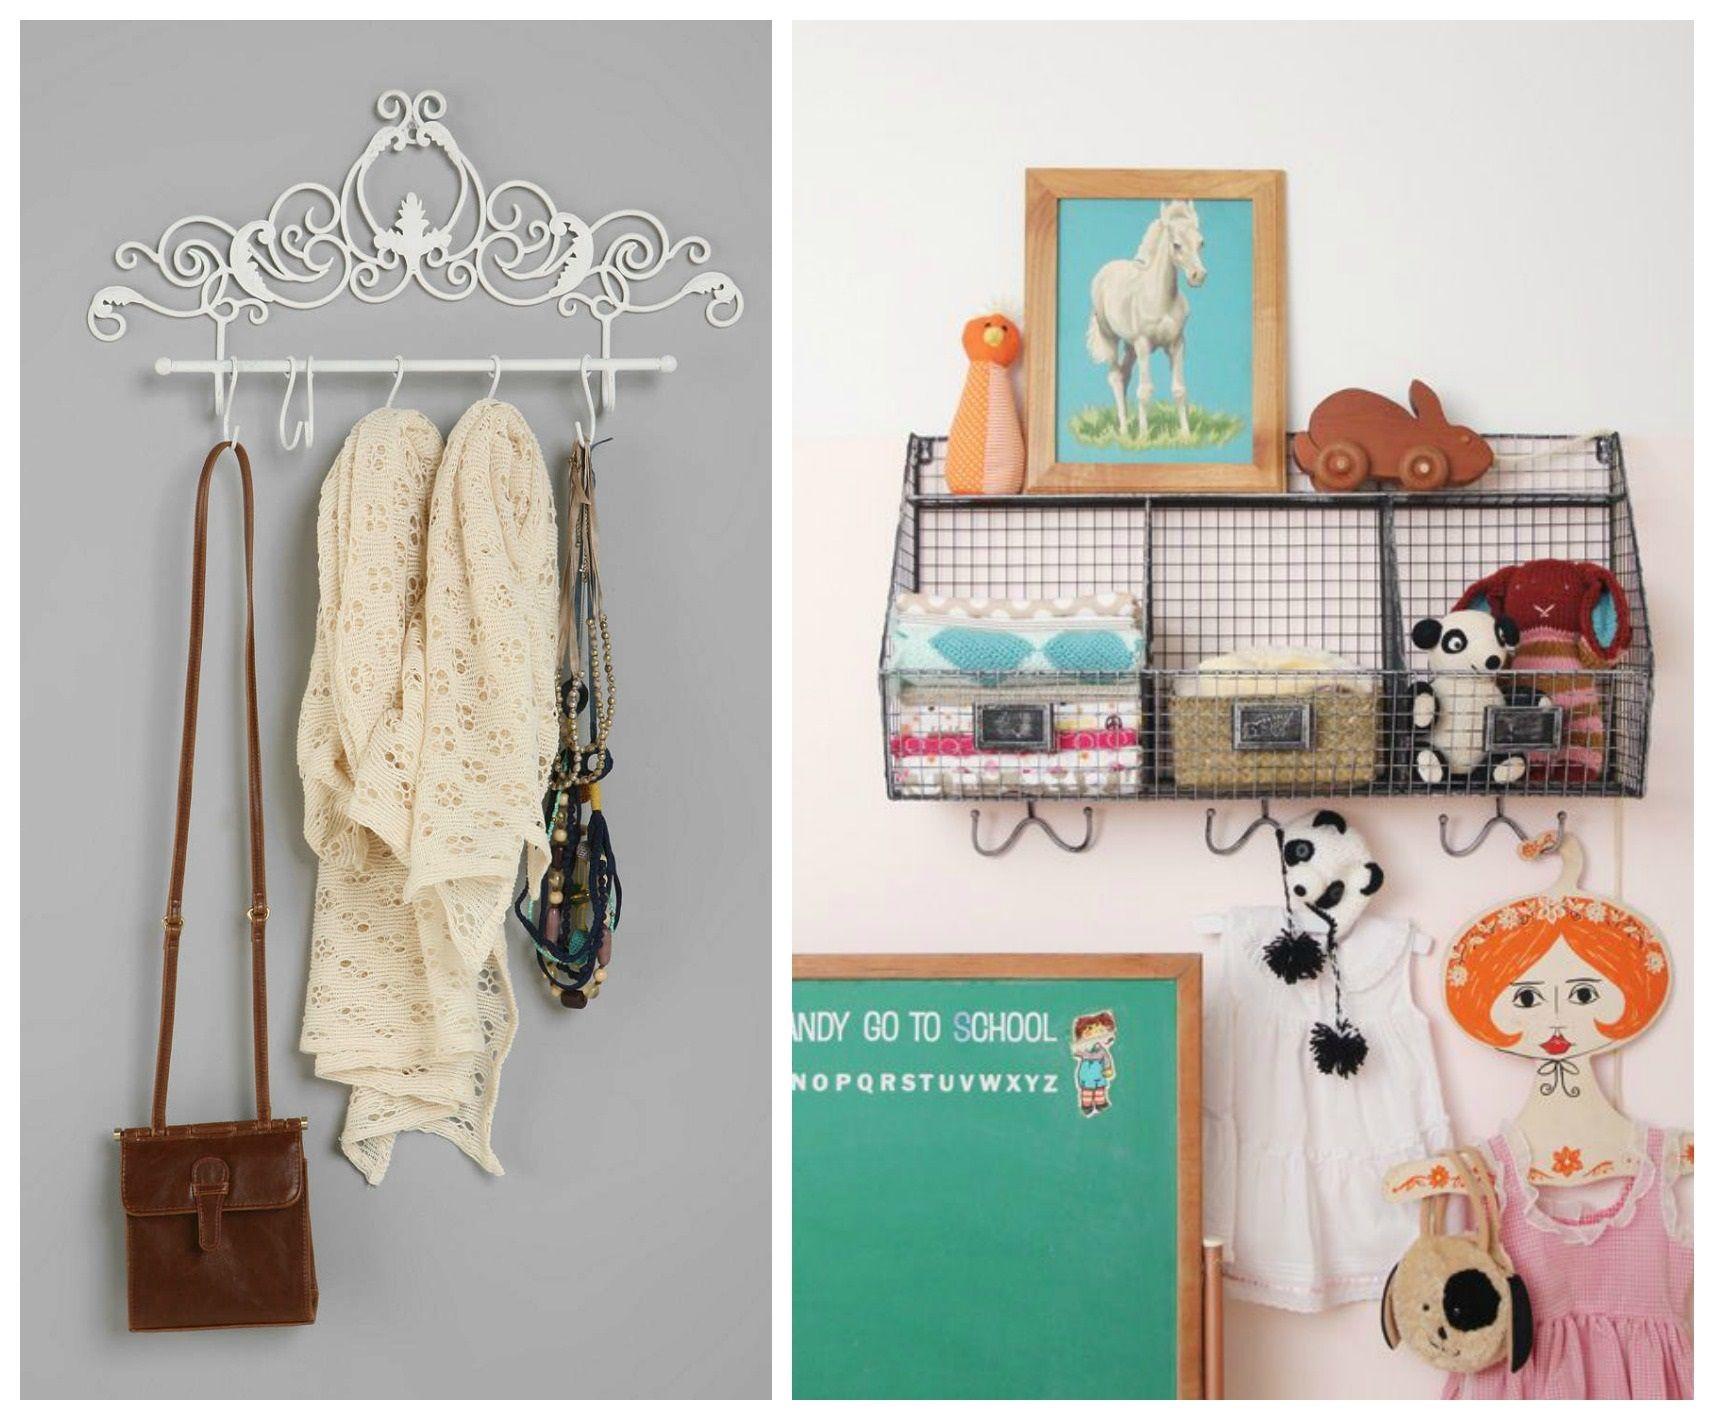 Elegant Home Hacks: 19 Tips To Organize Your Bedroom   Thegoodstuff